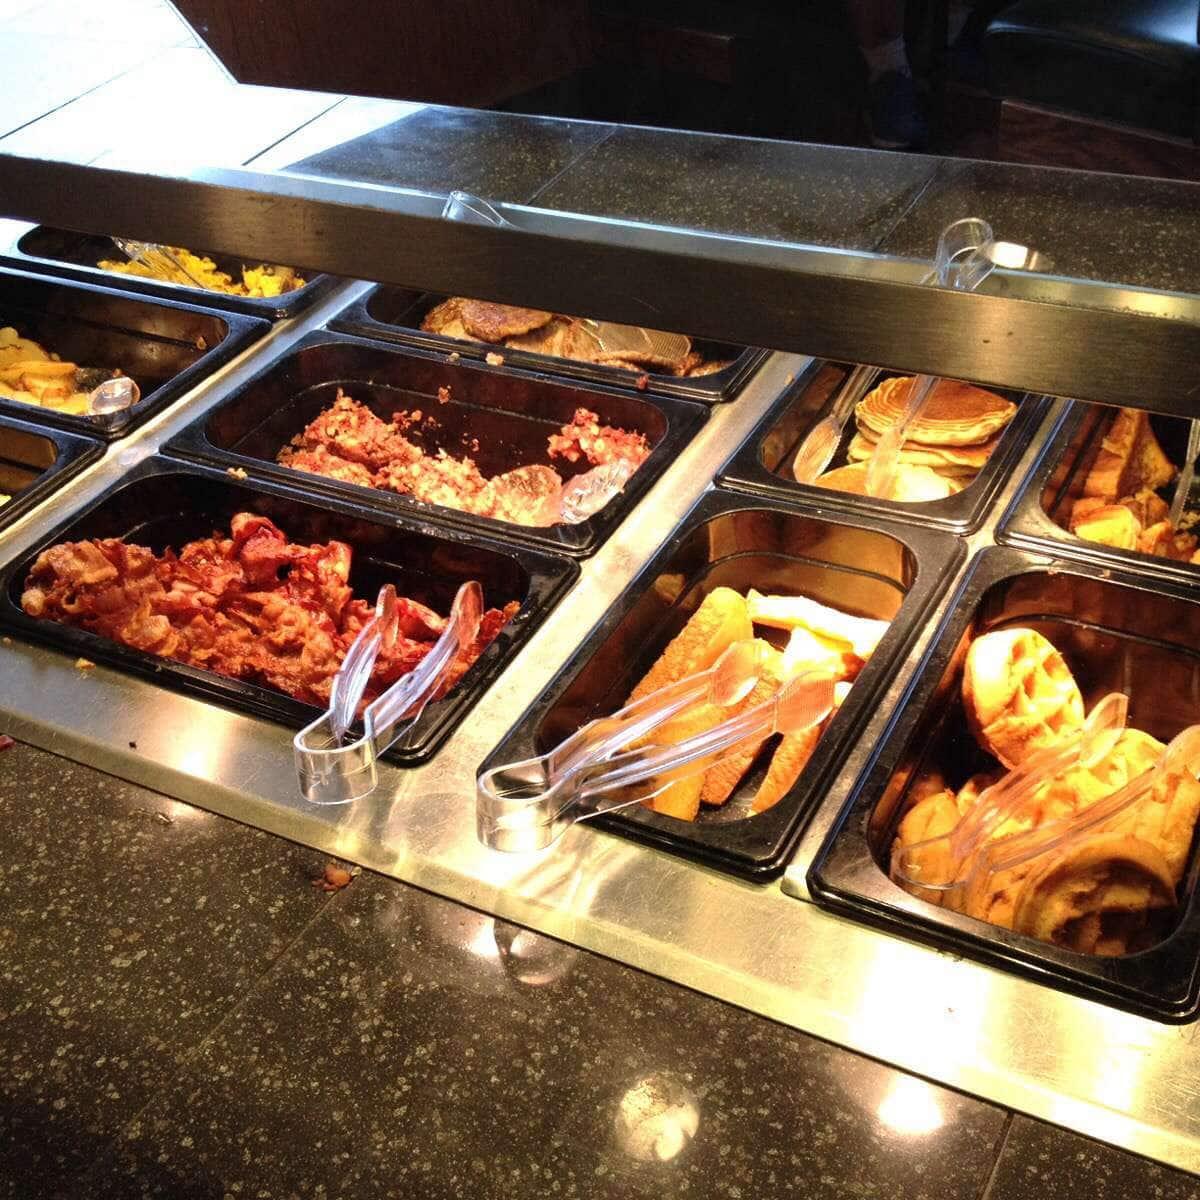 eat n park restaurant bethel park bethel park pittsburgh rh zomato com eat n park breakfast buffet hours dubois pa Old Country Buffet Breakfast